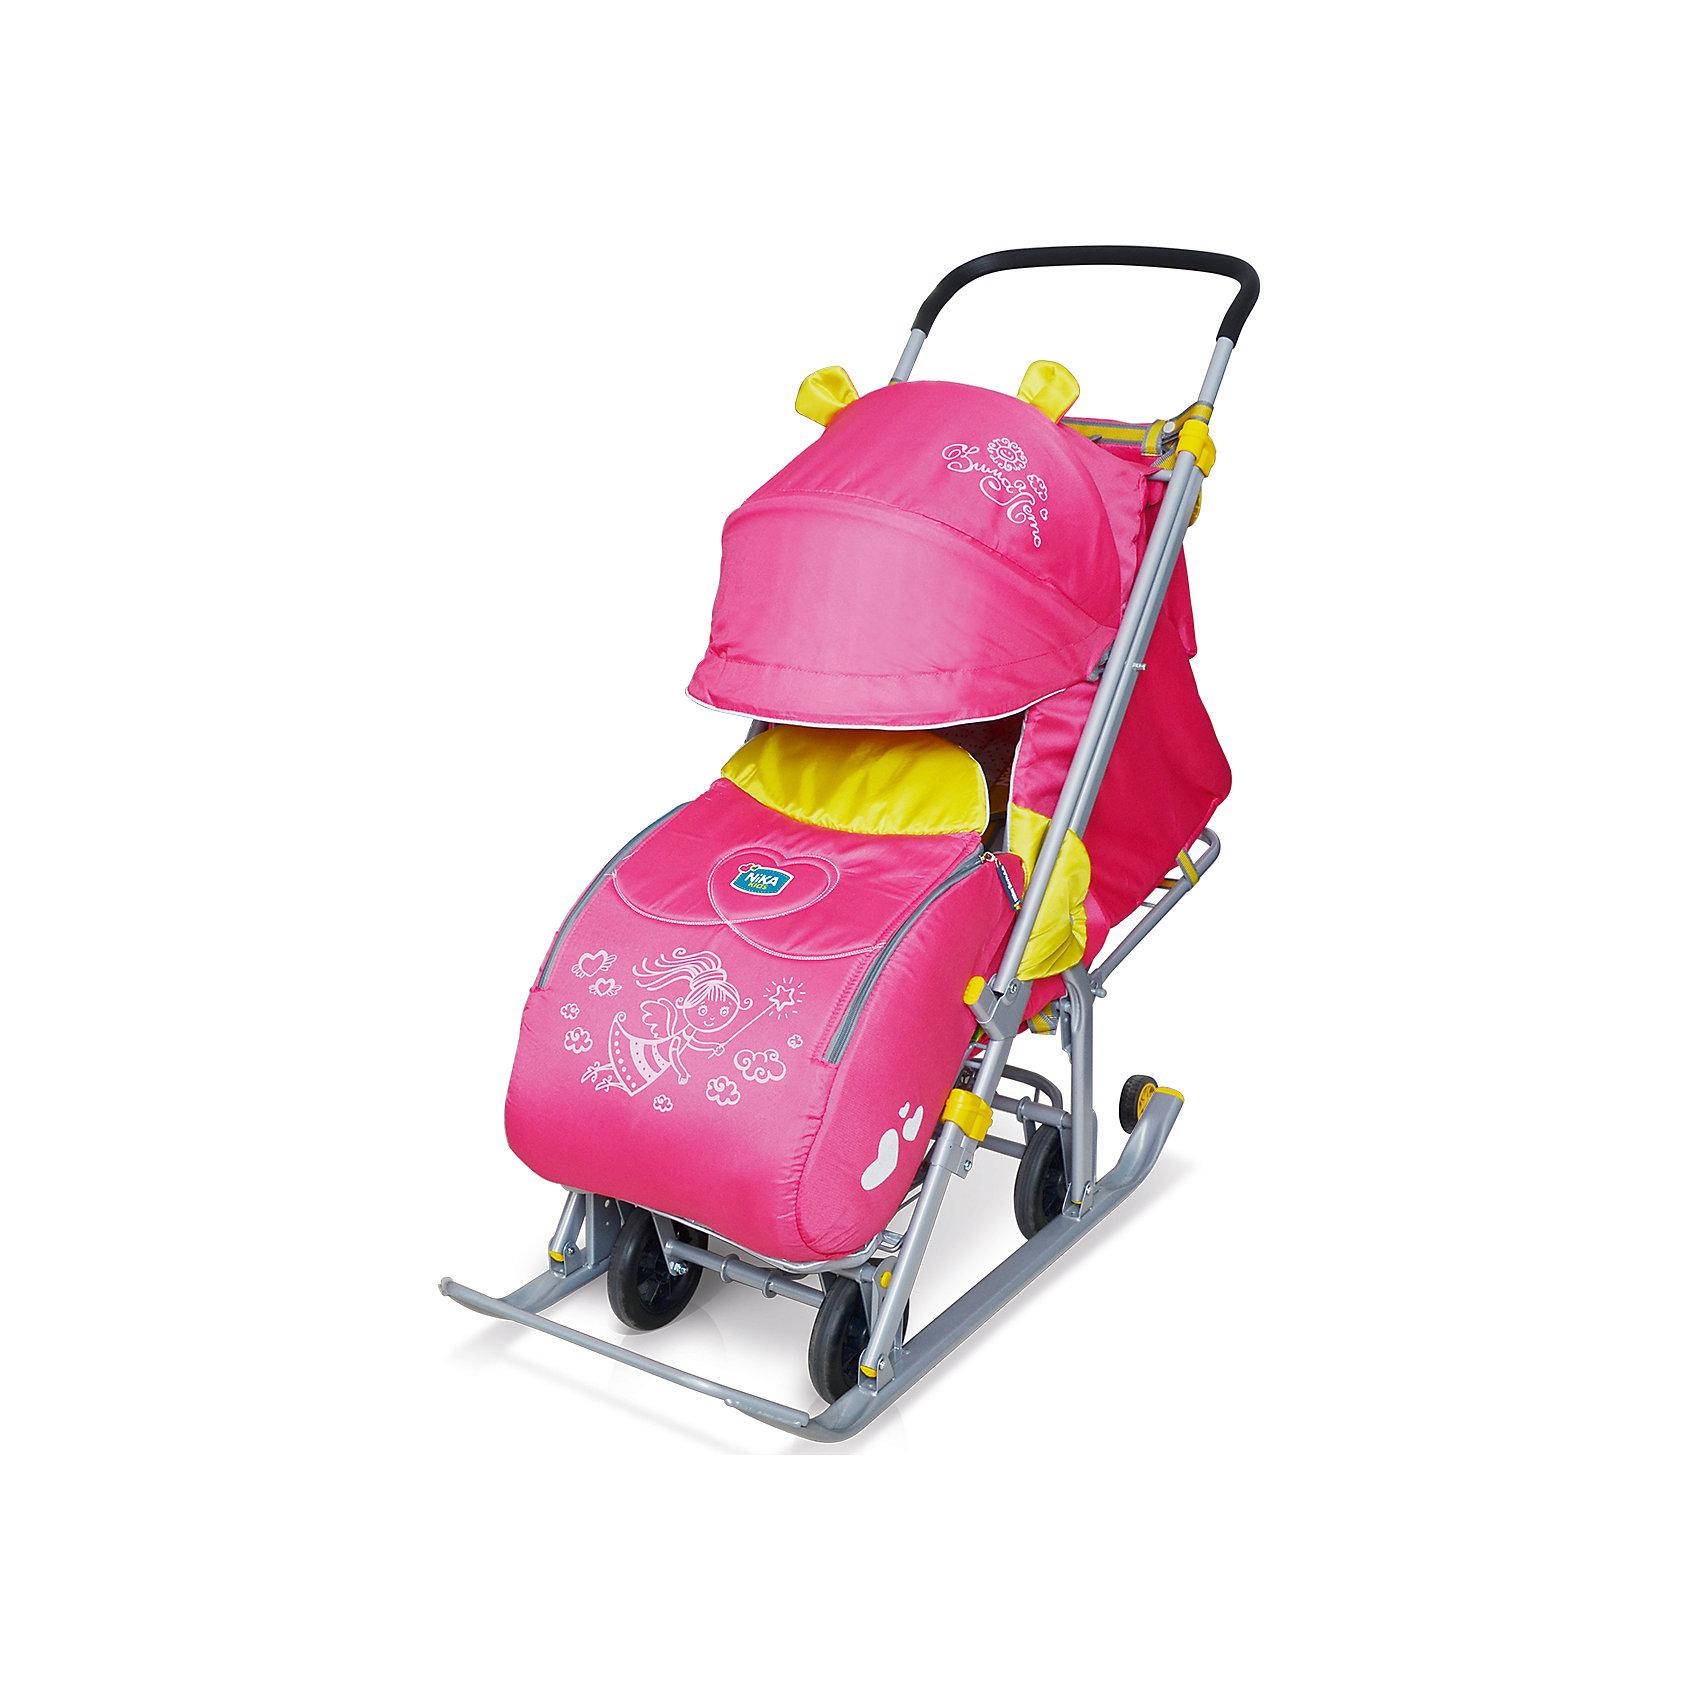 Ника Санки-коляска Ника детям 7, Фея, детские санки коляска ника детям 7 4 мятный